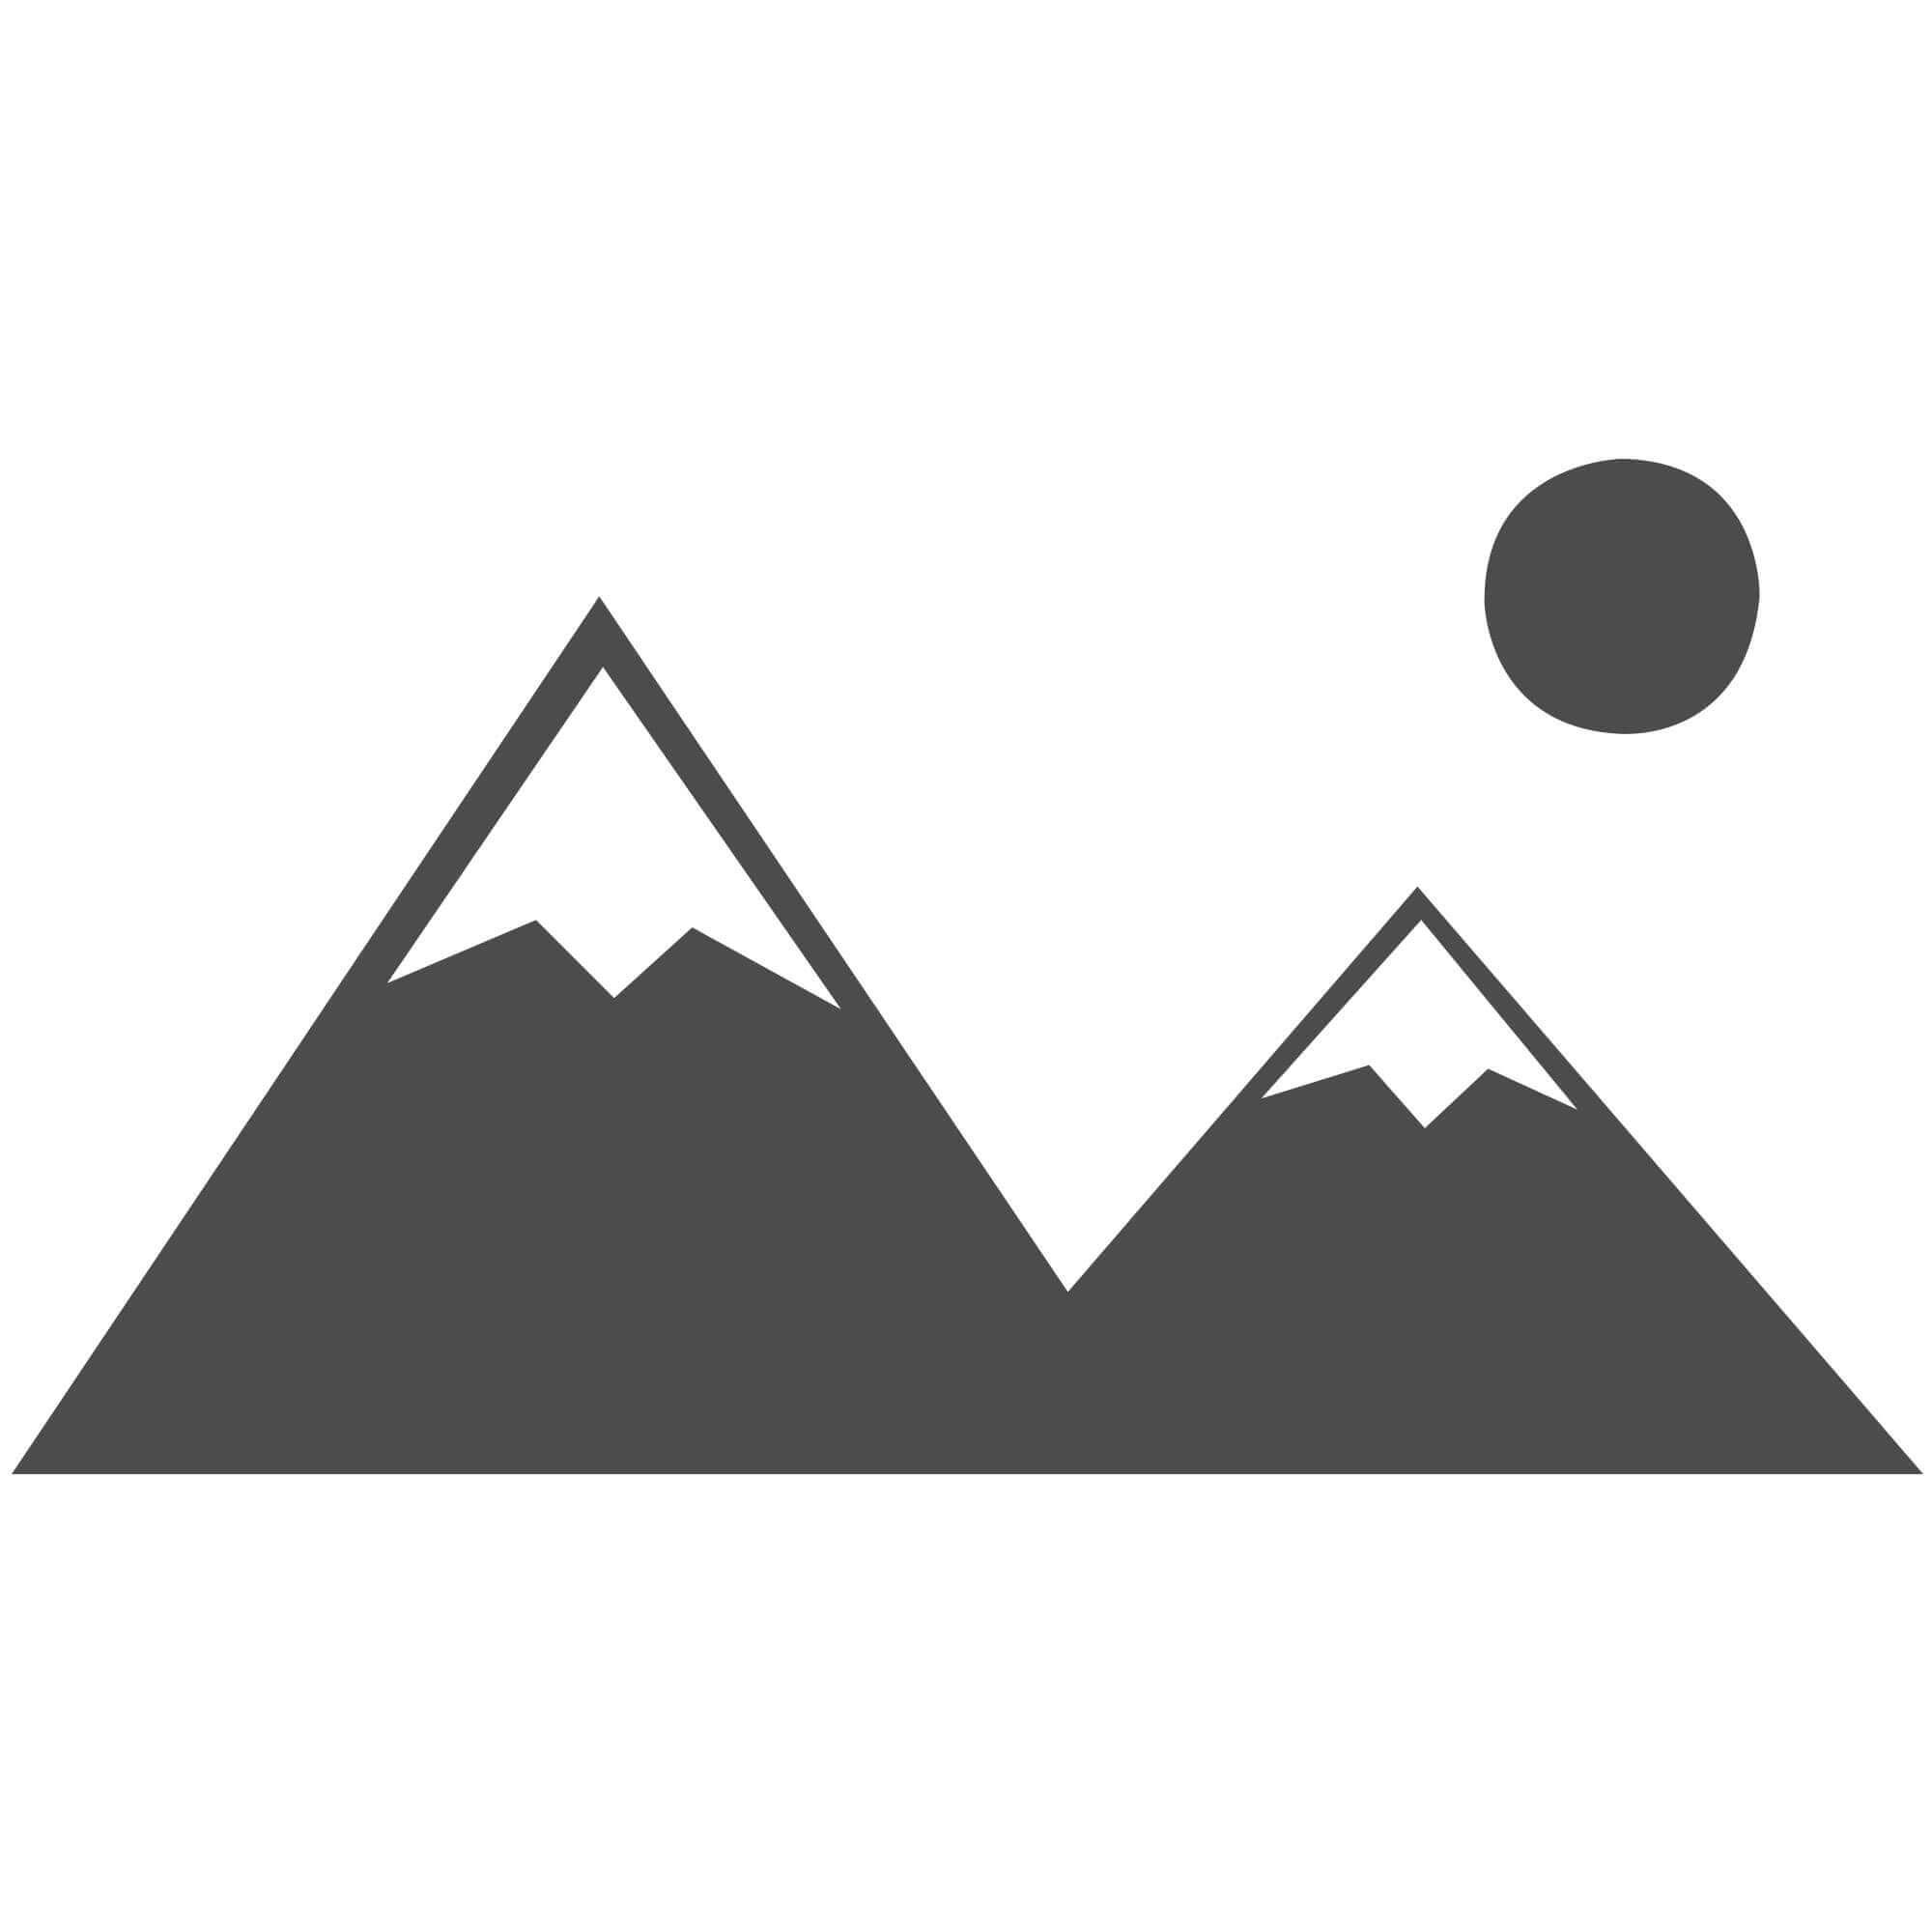 "Shatter Rug - Black Grey - Size 200 x 290 cm (6'7"" x 9'6"")"